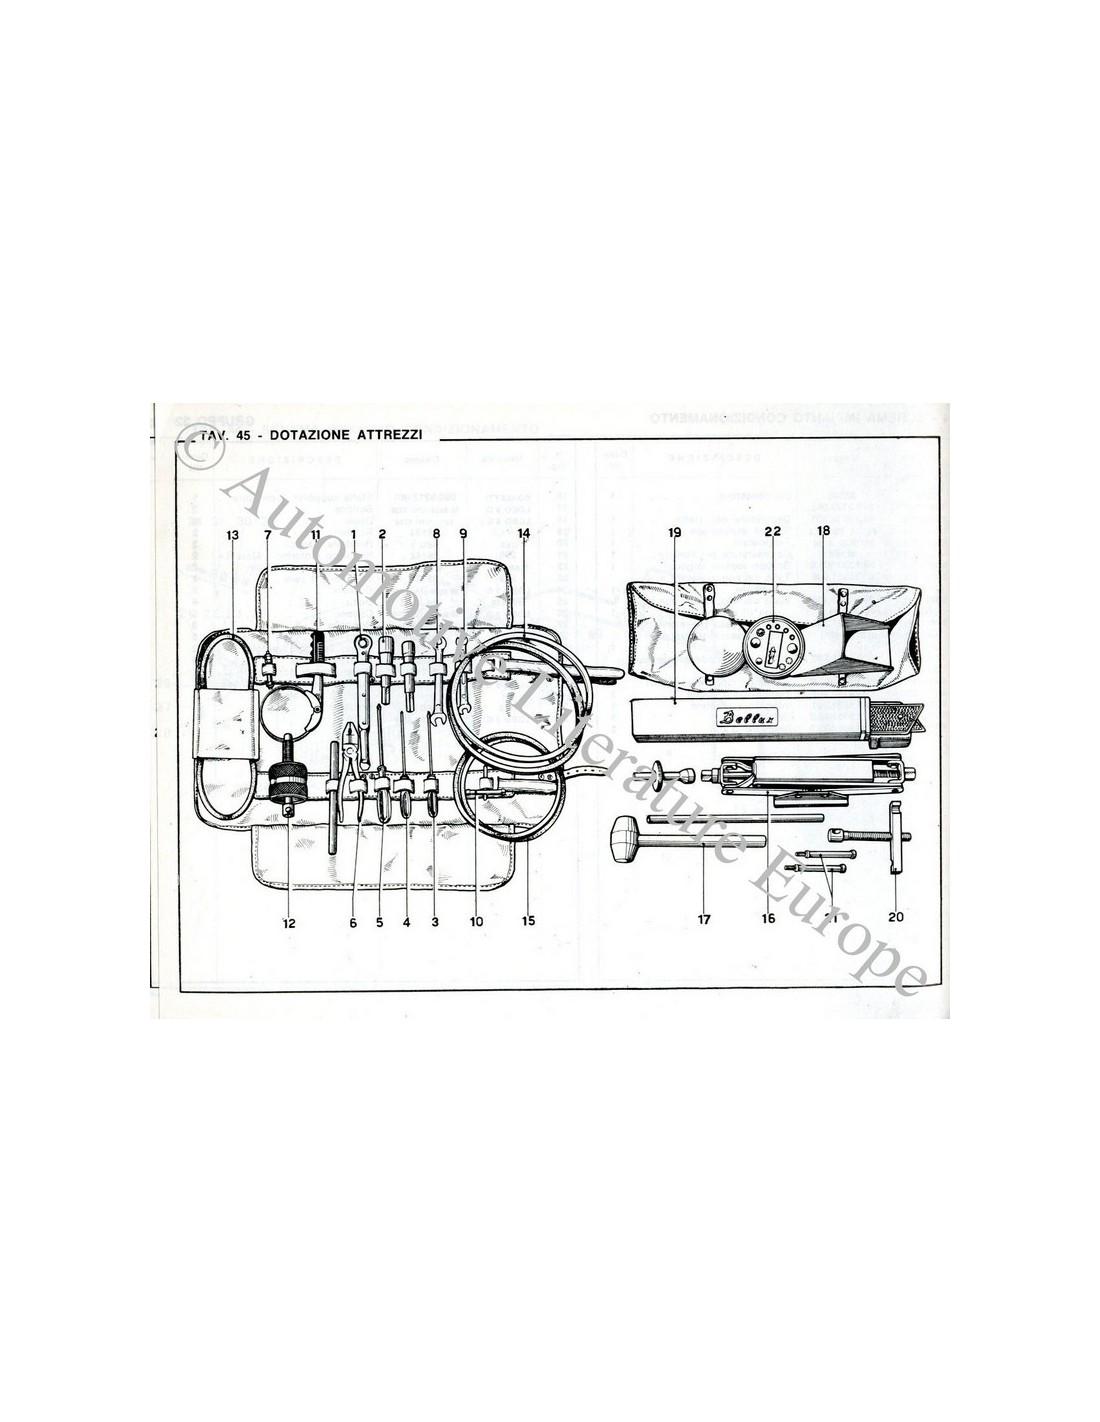 1969 FERRARI 365GT 2+2 SPARE PARTS CATALOG 35/69